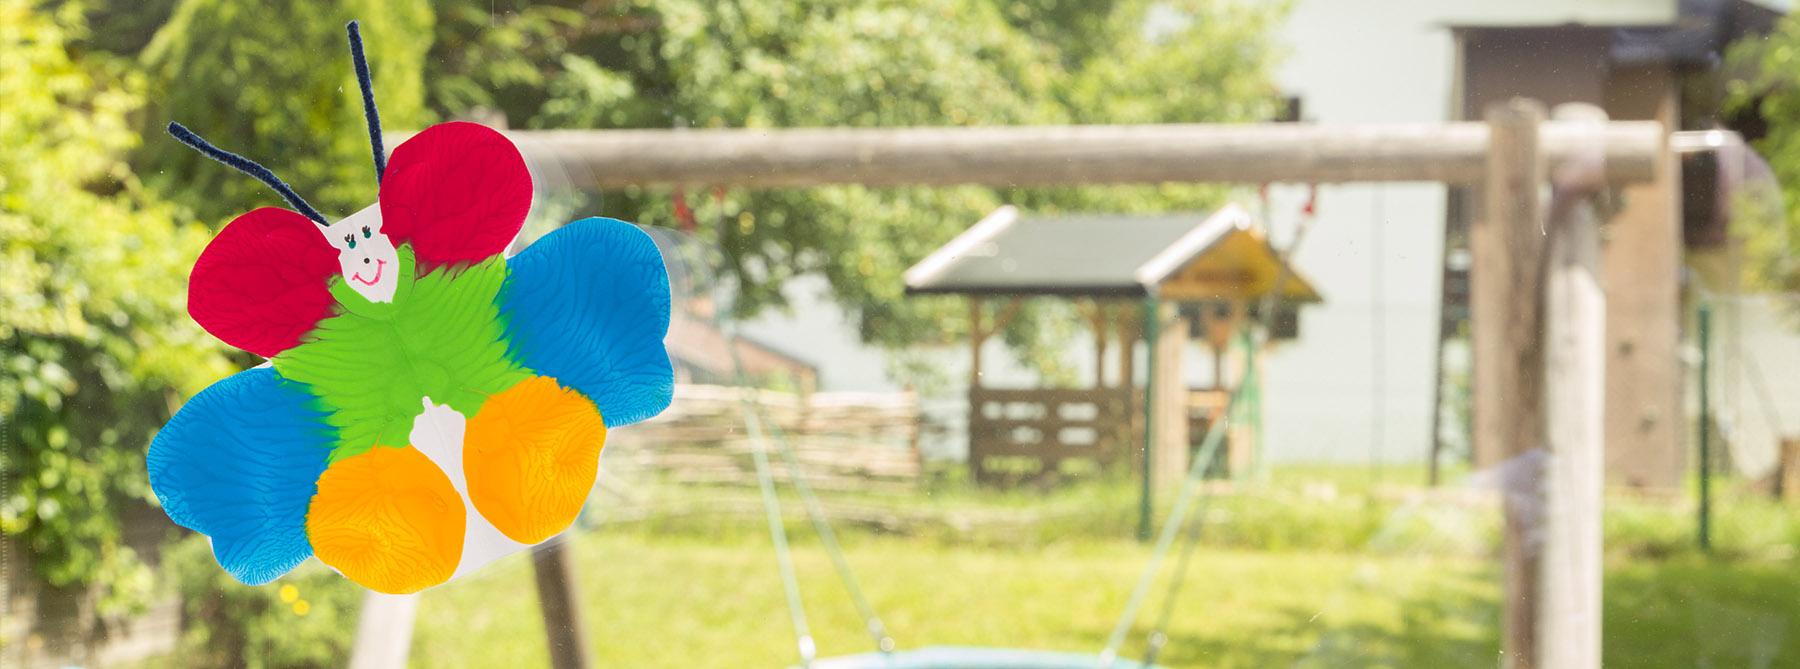 Audorfer-Kindernest1-Kindergarten-Kinderkrippe-Kinderhort